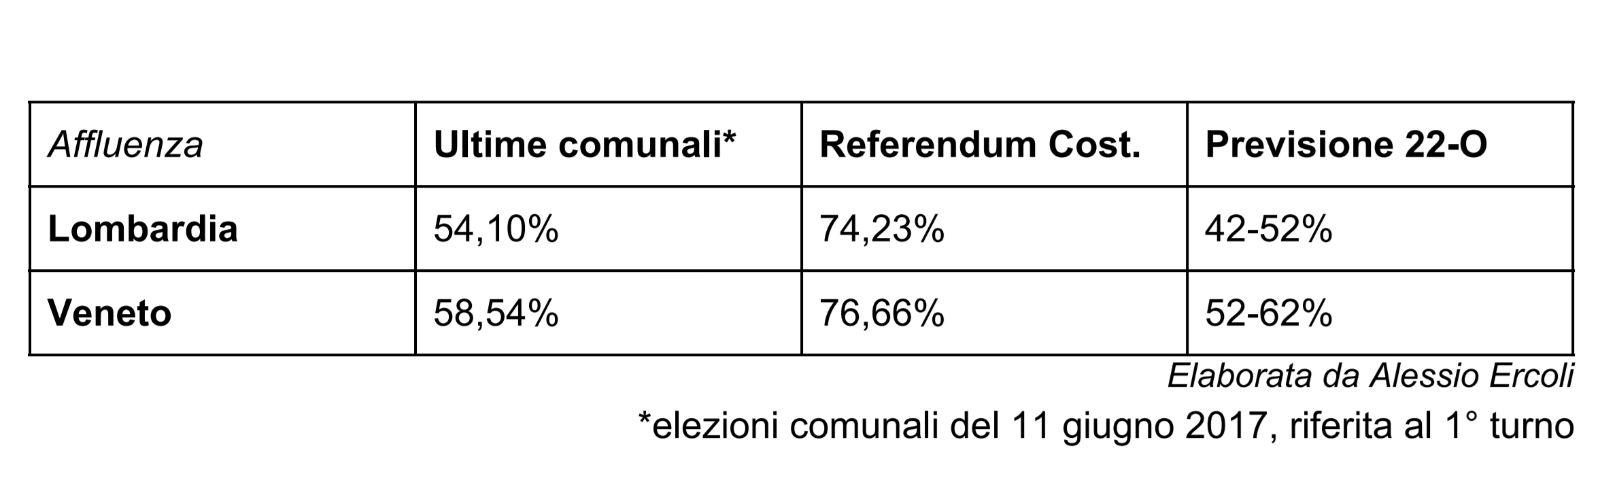 Previsione affluenza referendum 22 ottobre